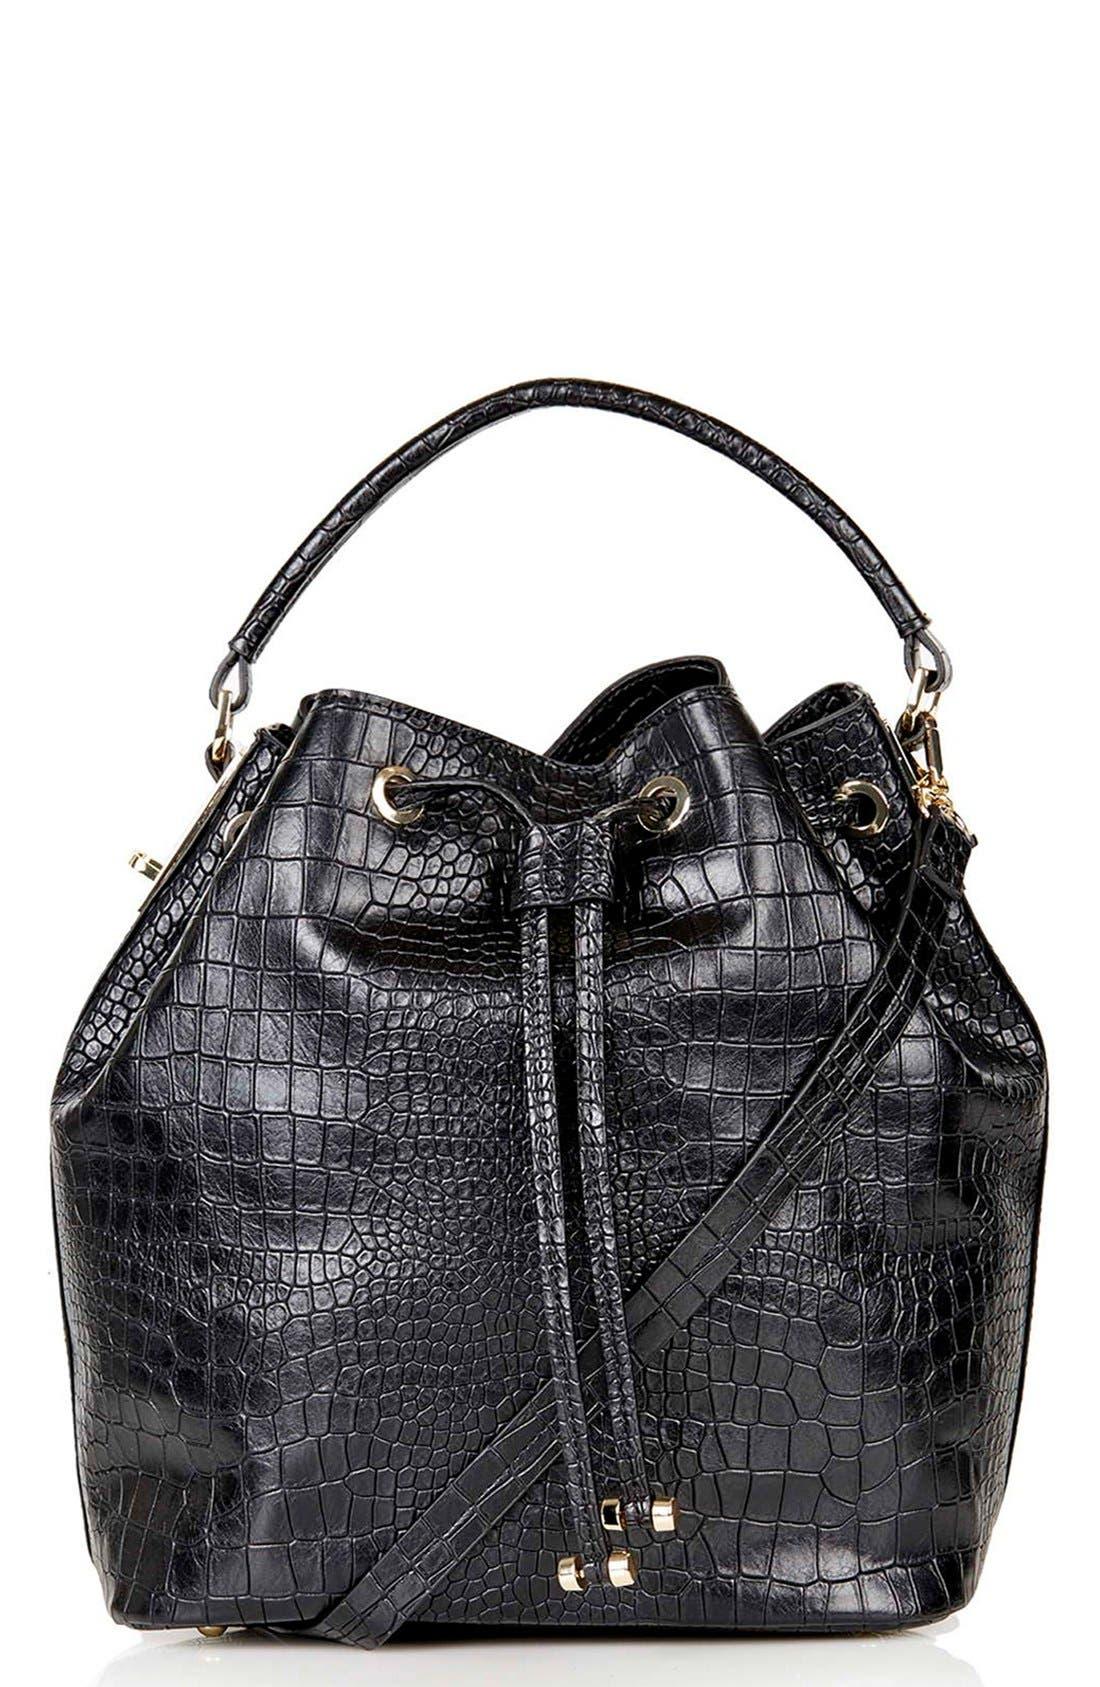 Croc Embossed Bucket Bag,                             Main thumbnail 1, color,                             001